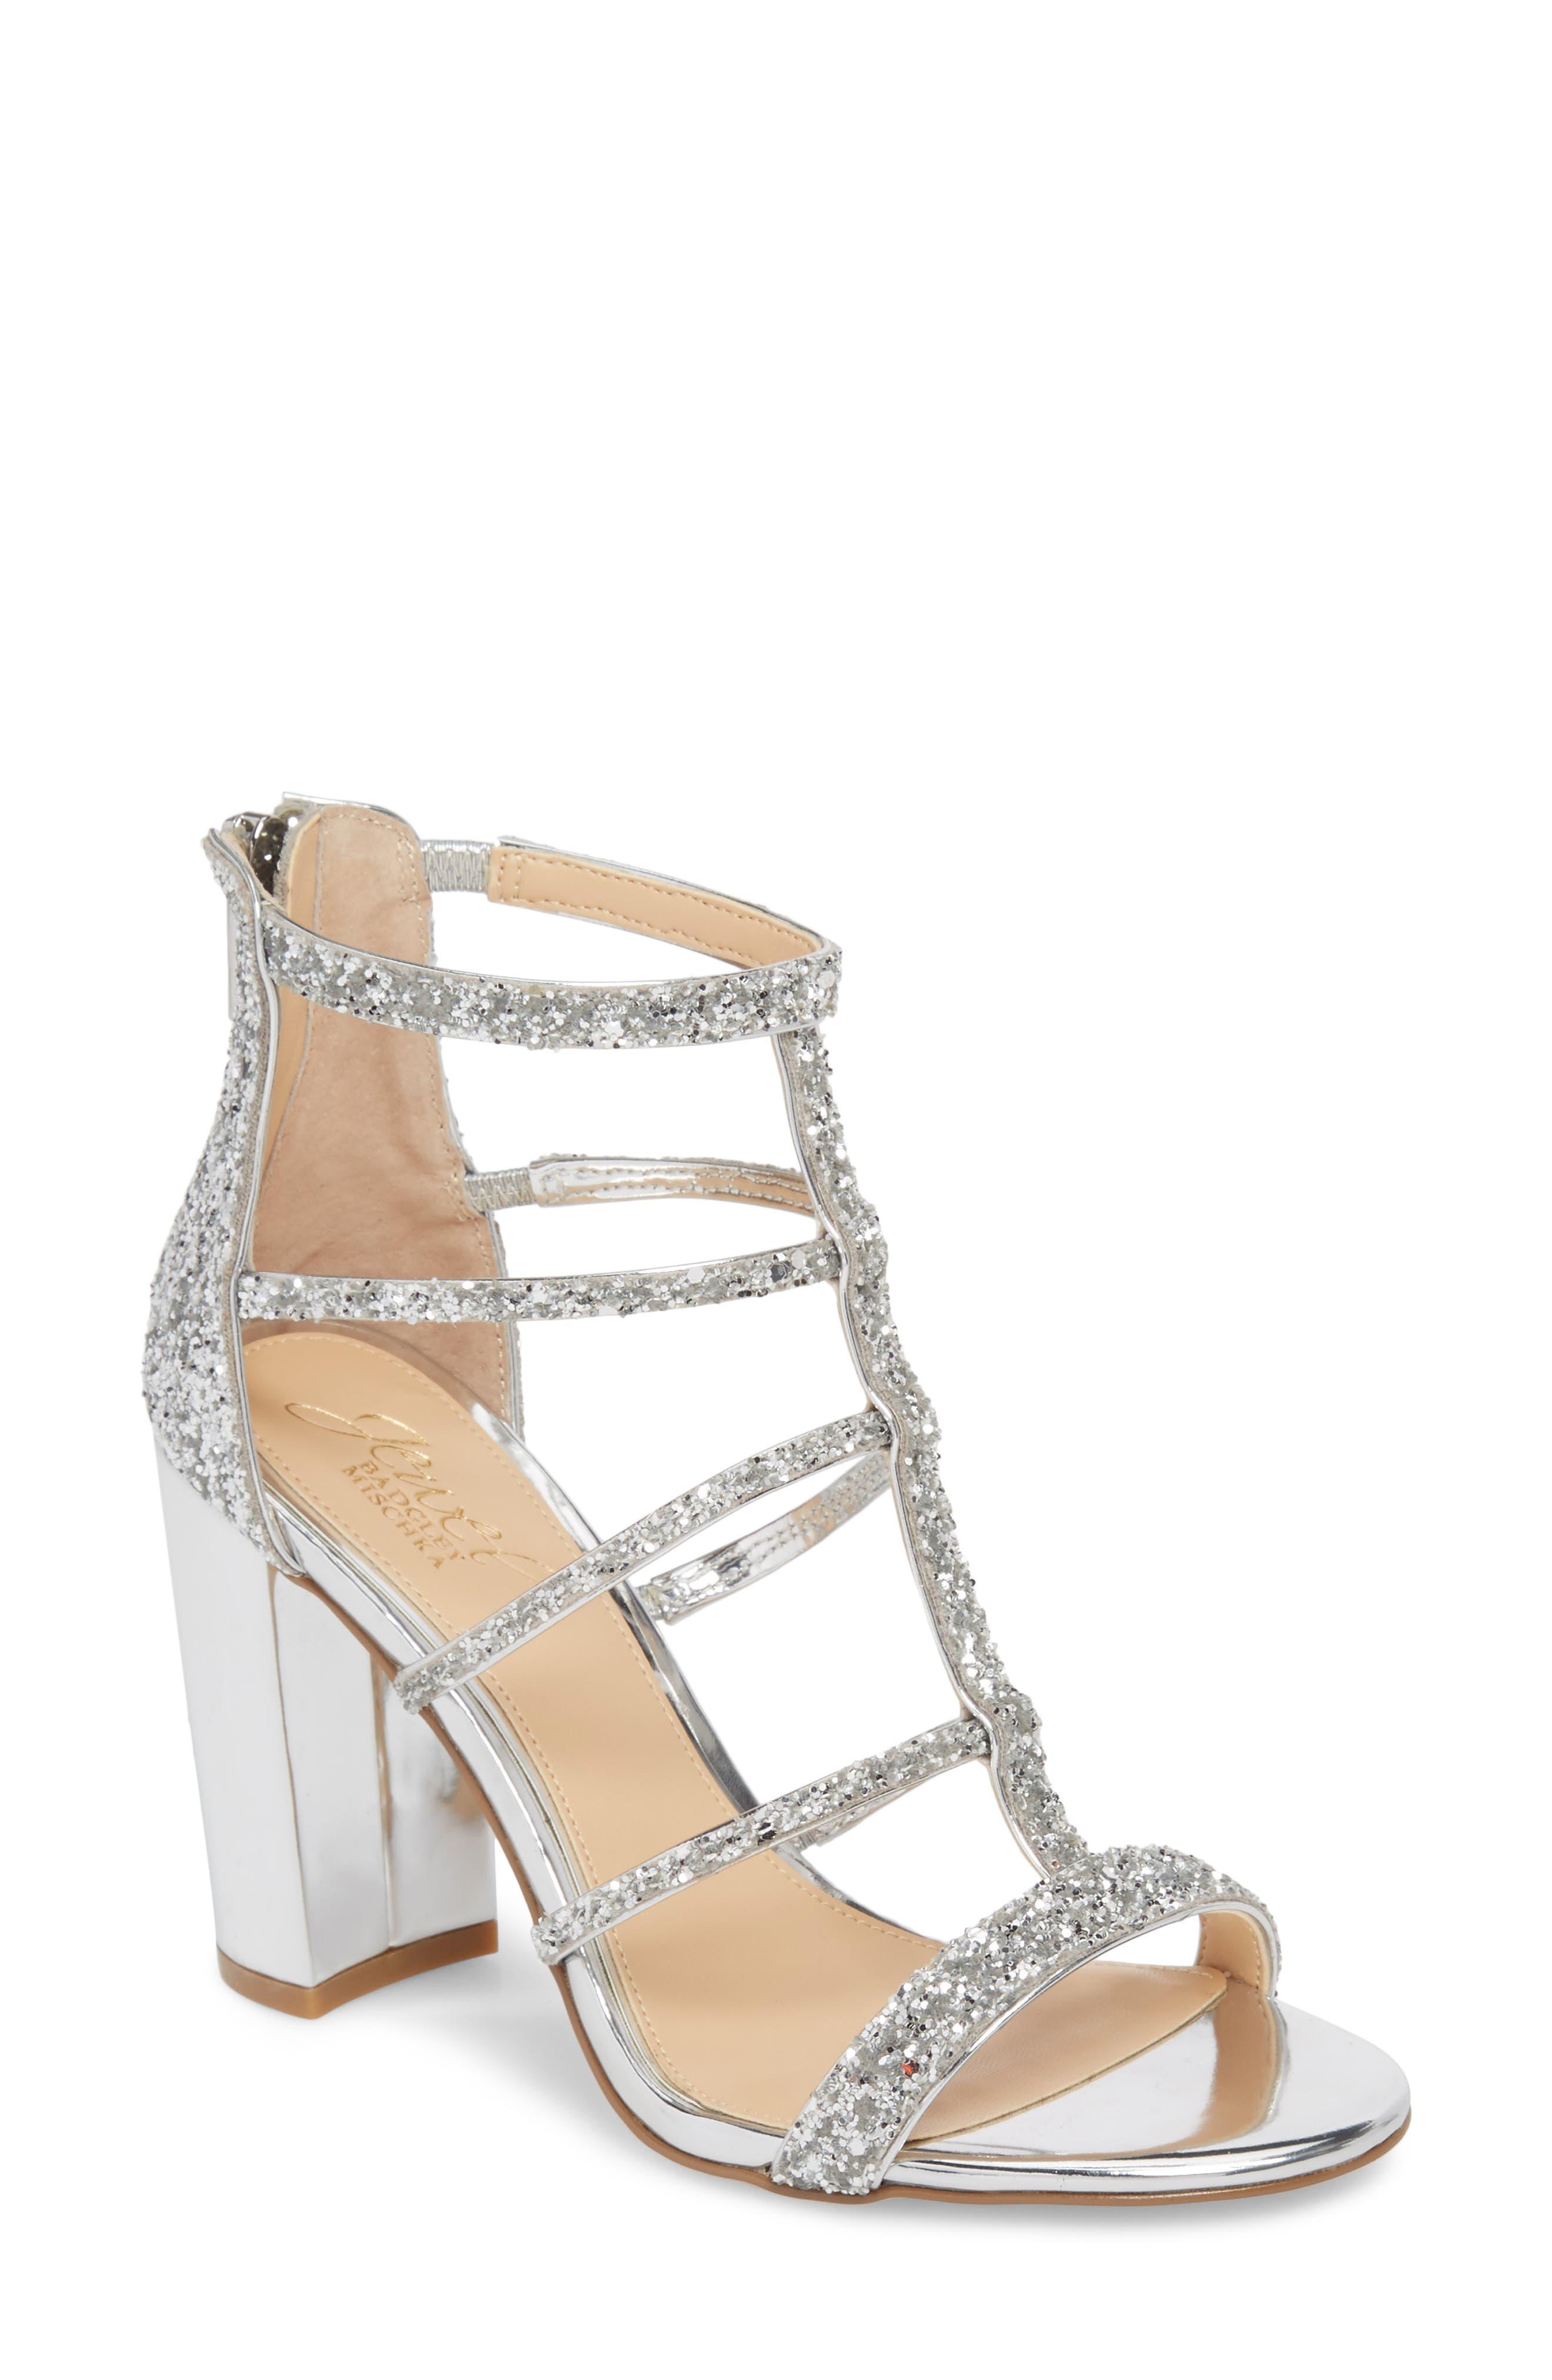 Main Image - Jewel Badgley Mischka Tiffy Glitter Sandal (Women)